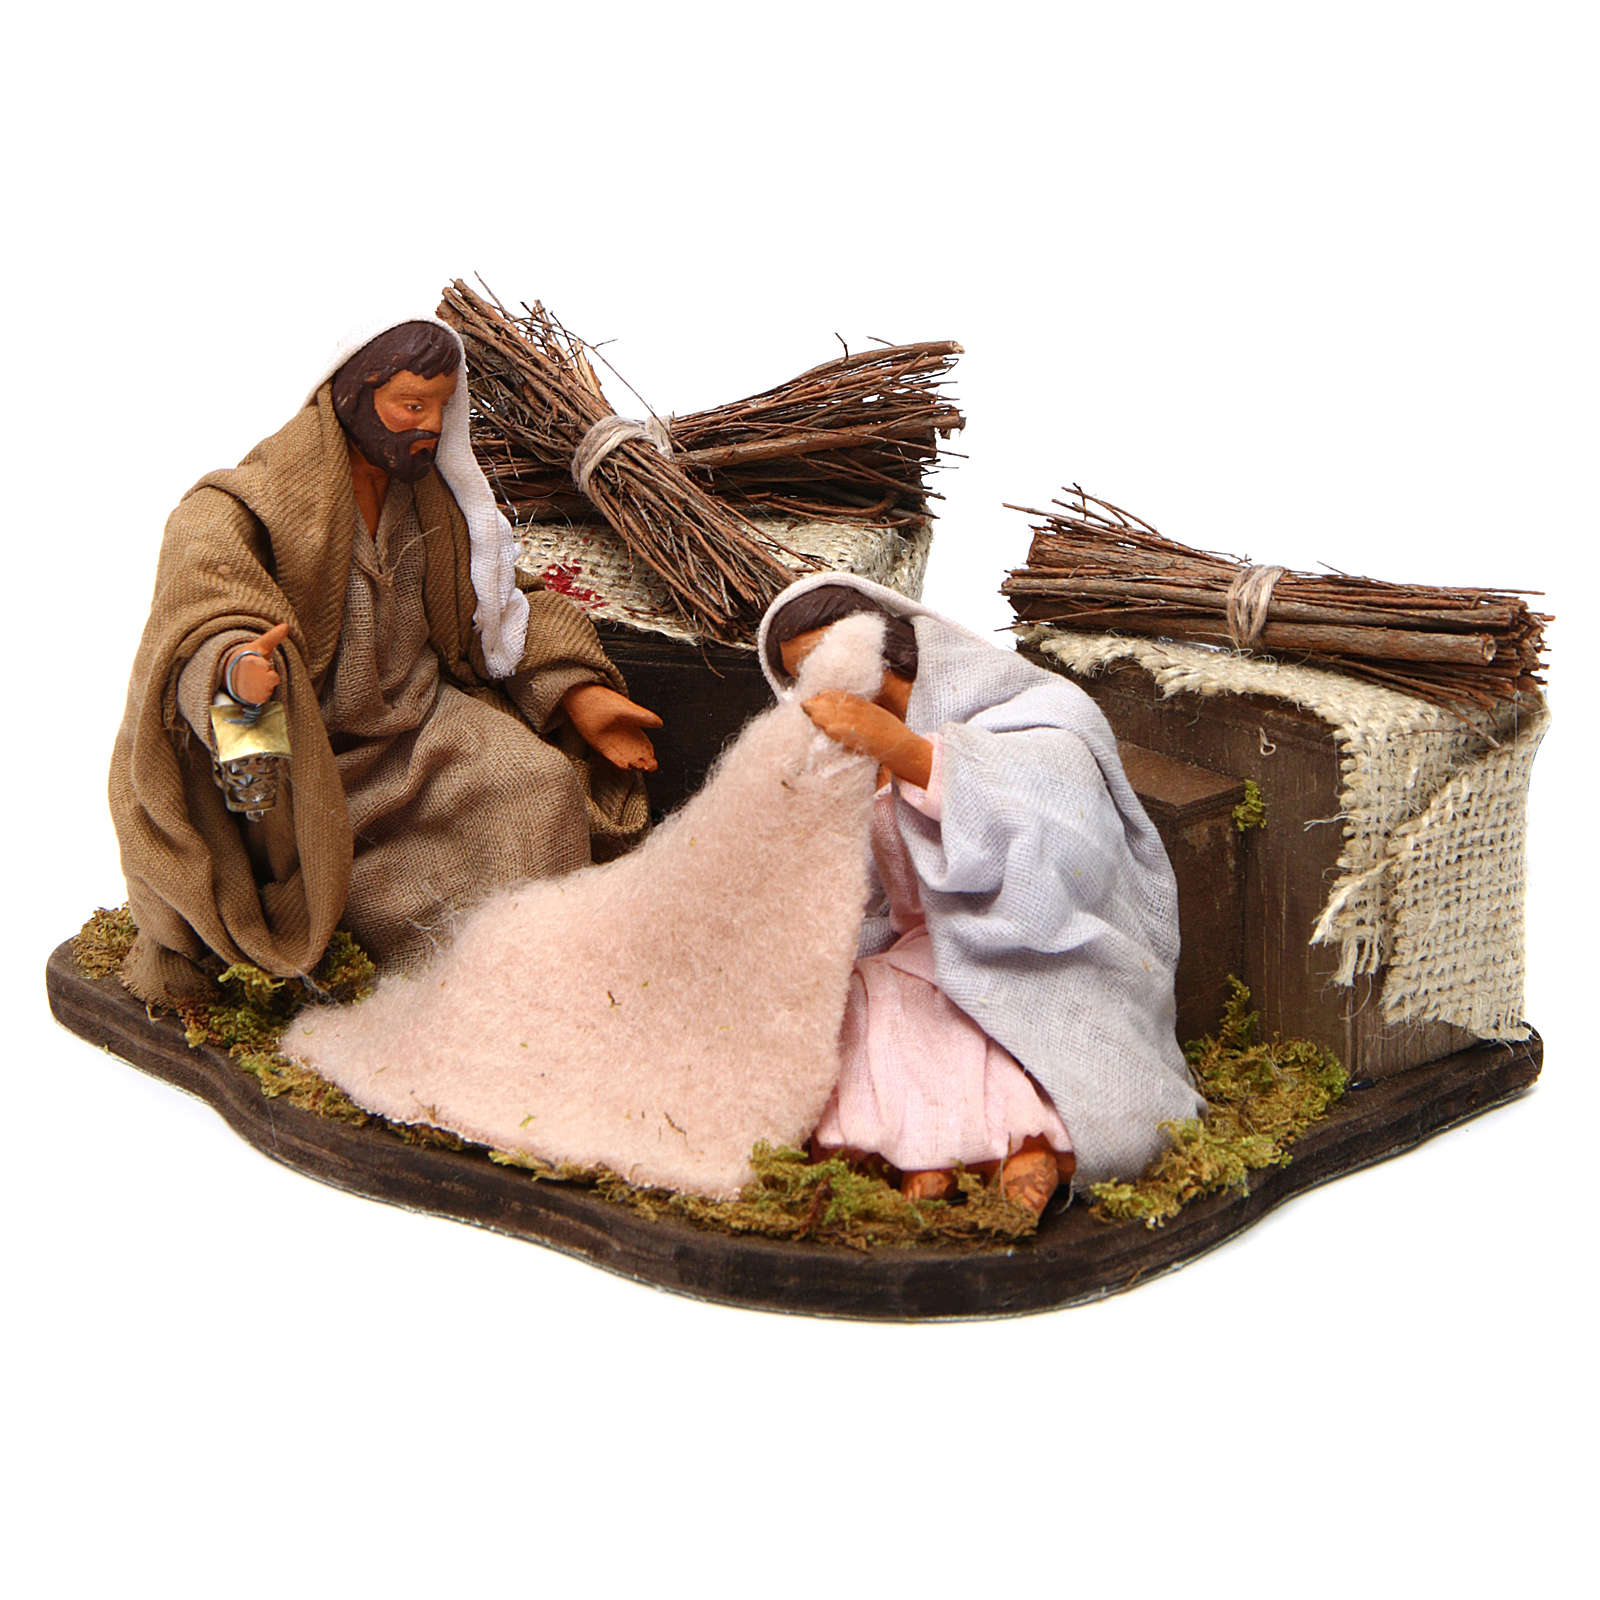 Moving sitting holy family Neapolitan nativity scene 12 cm 4